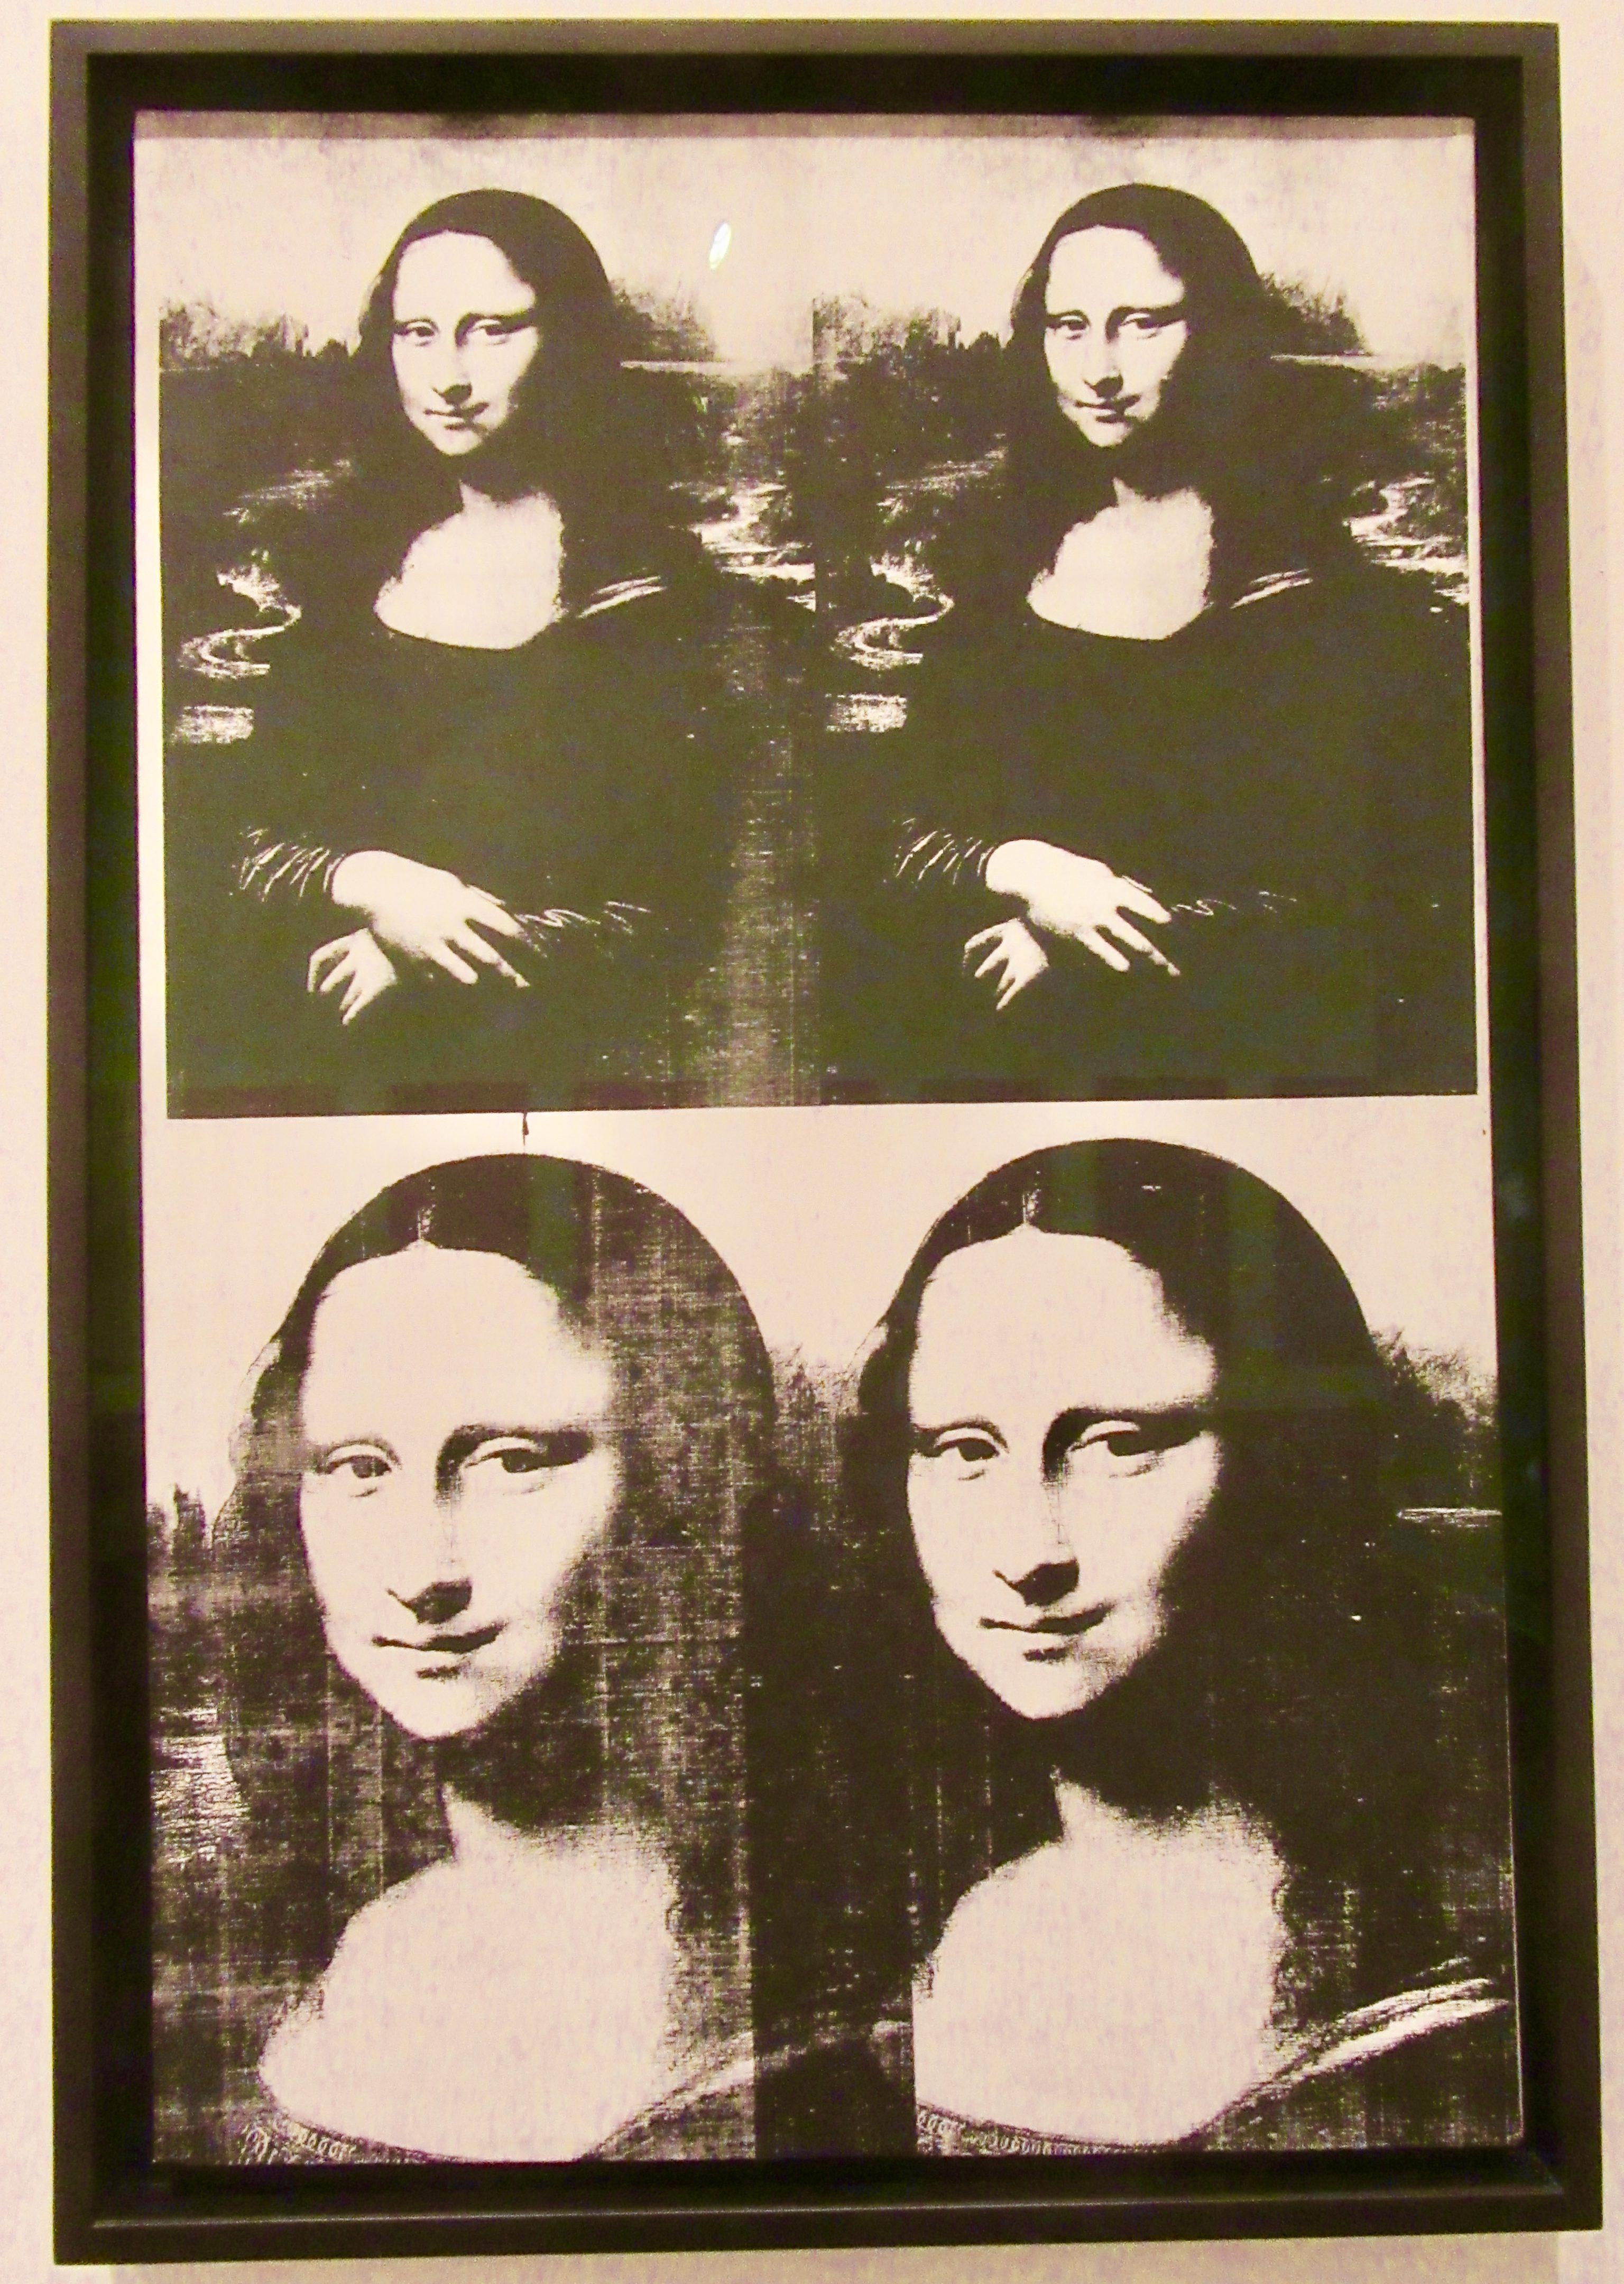 Superbe Modern Art Monday Presents: Andy Warhol, Mona Lisa   The Worley Gig @VF_48